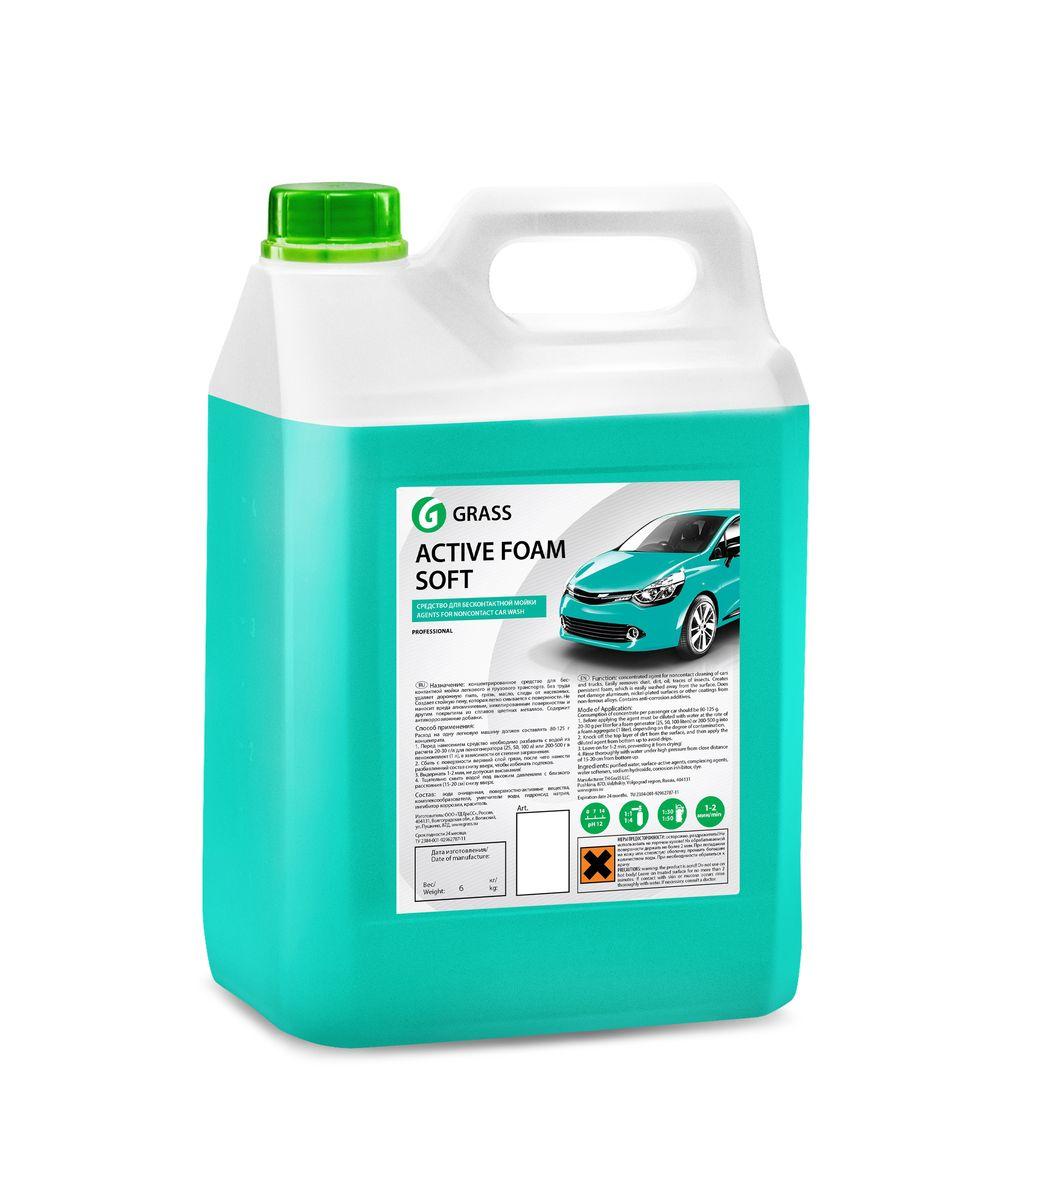 Активная пена Grass  Active Foam Soft , 5,8 кг - Автохимия и косметика - Автошампуни и полироли